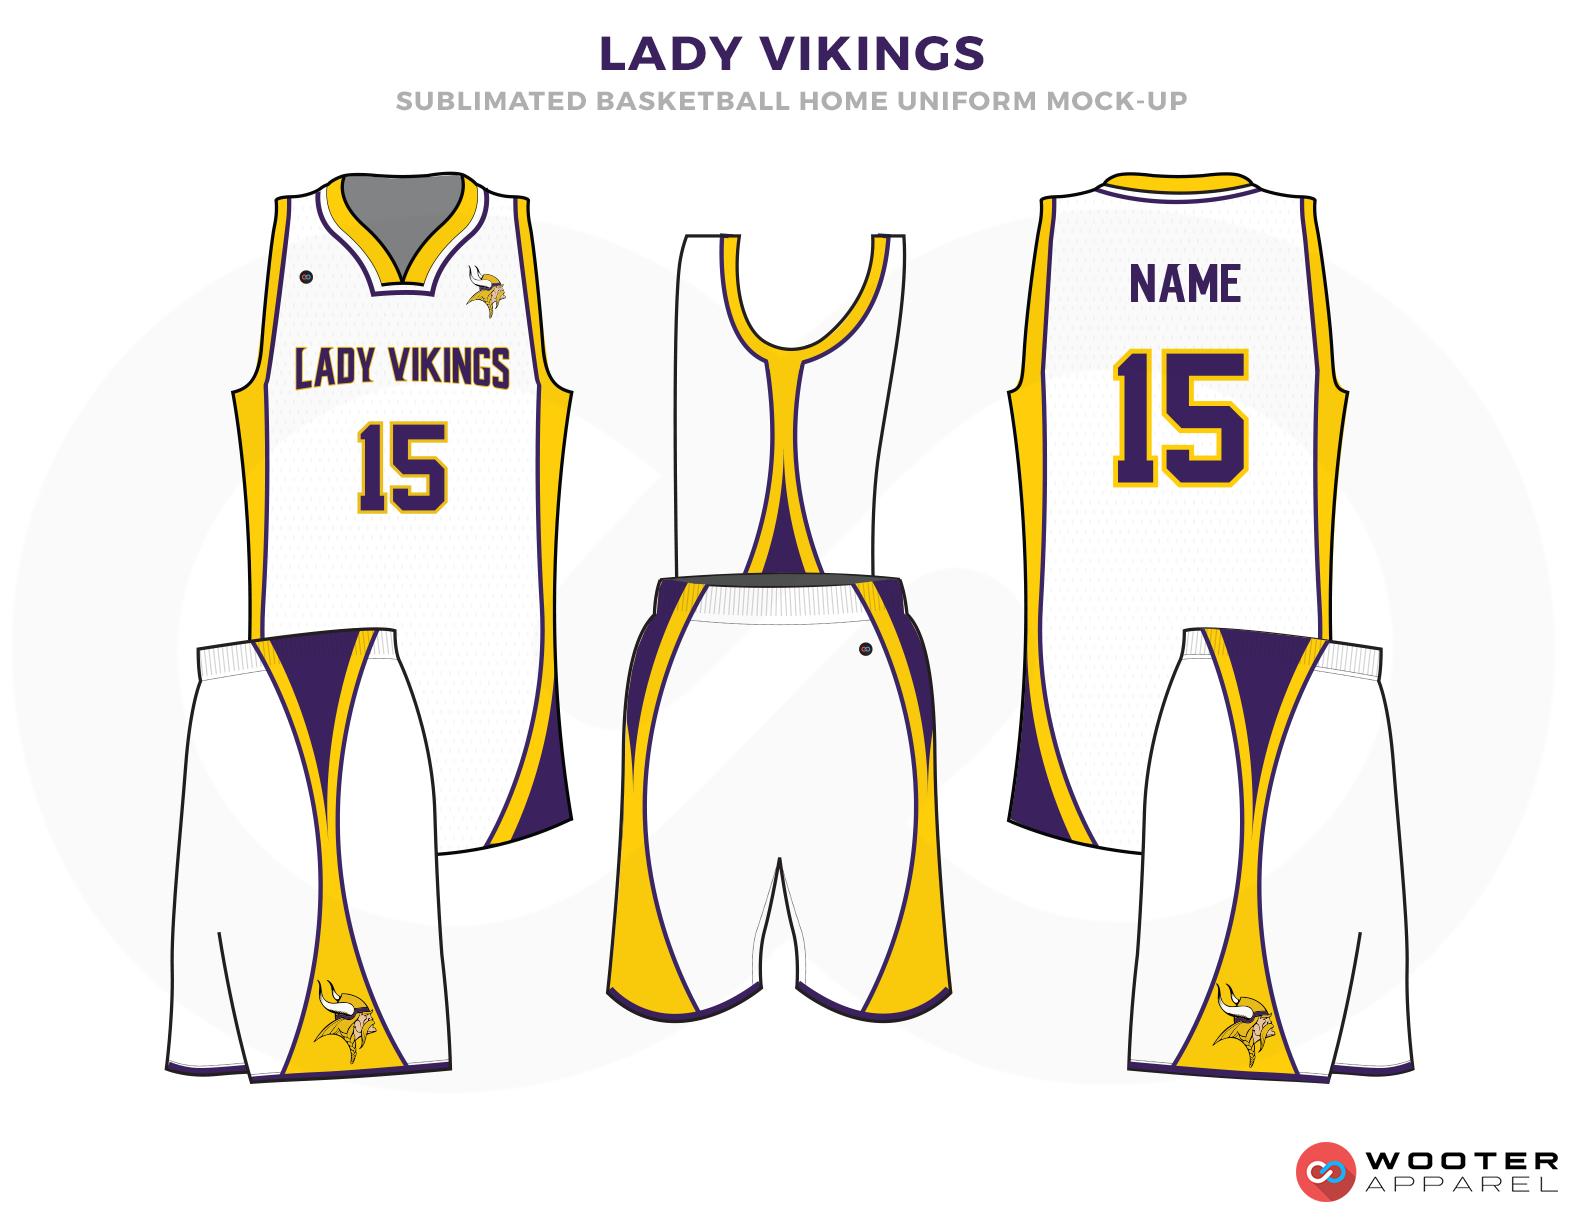 LADY VIKINGS White Yellow and Purple Basketball Uniforms, Jersey and Shorts